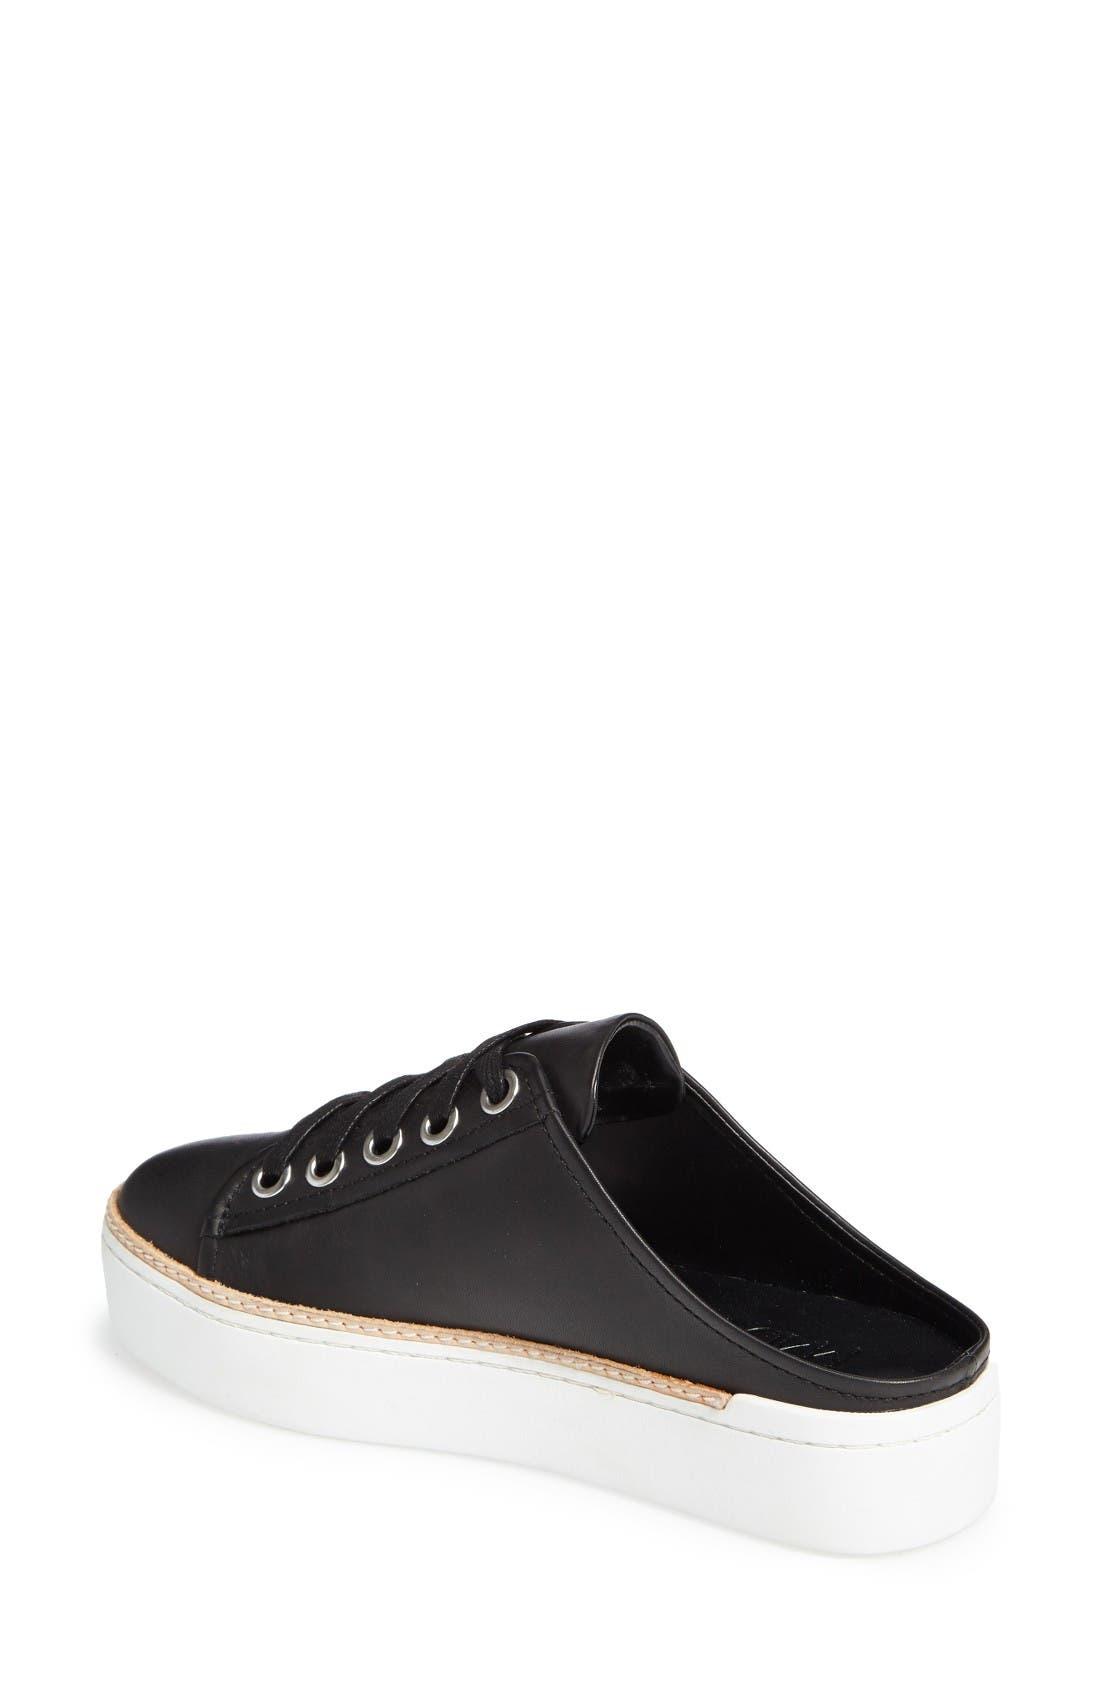 M4D3 Slide Platform Sneaker,                             Alternate thumbnail 2, color,                             Black